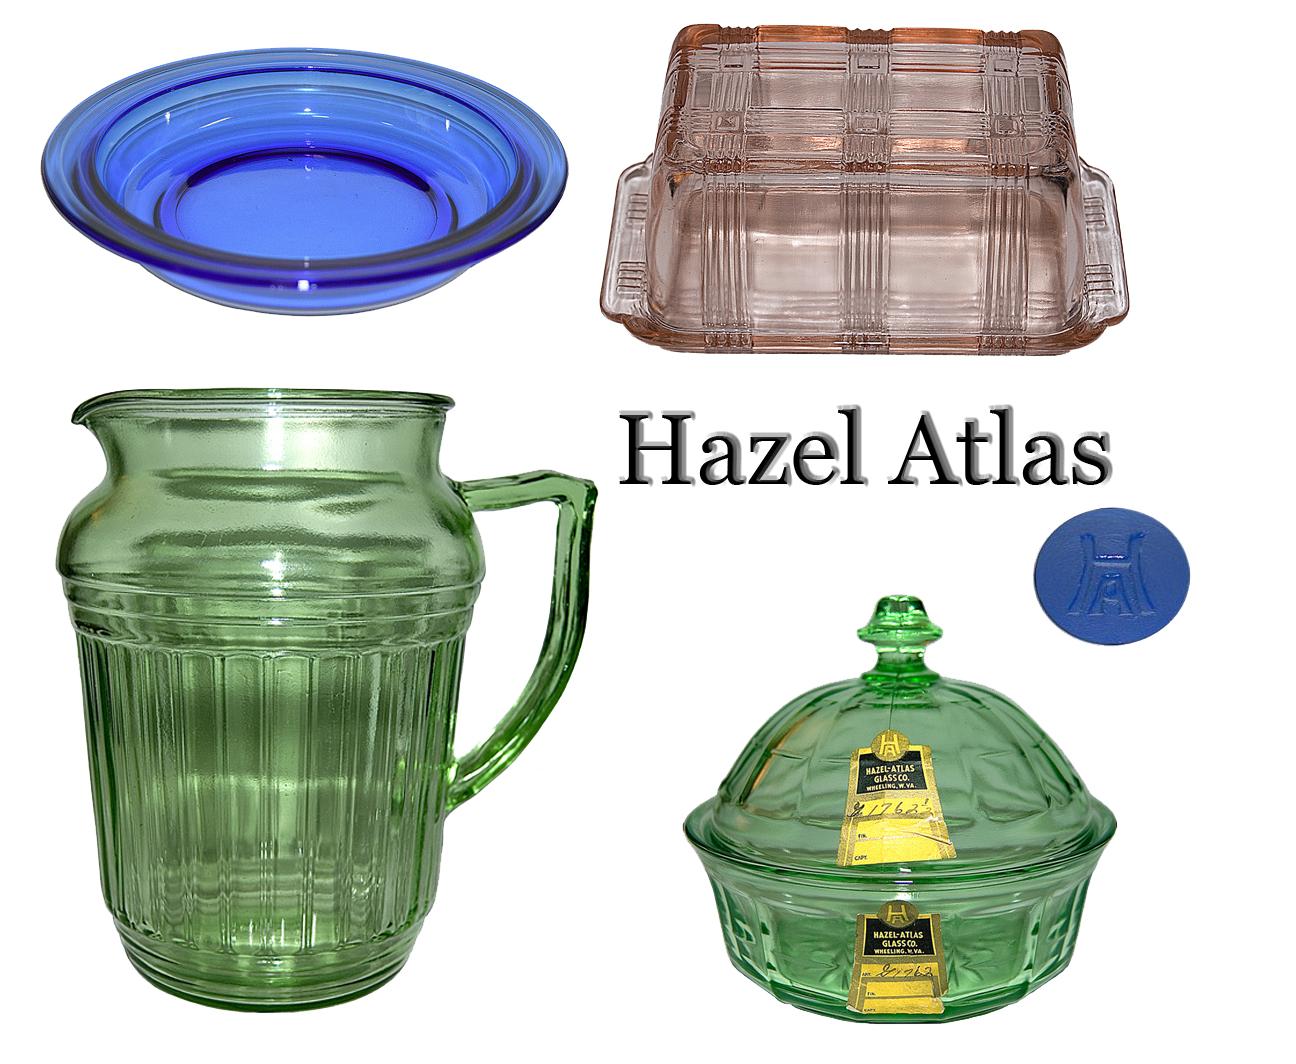 Hazel Atlas Company Picture